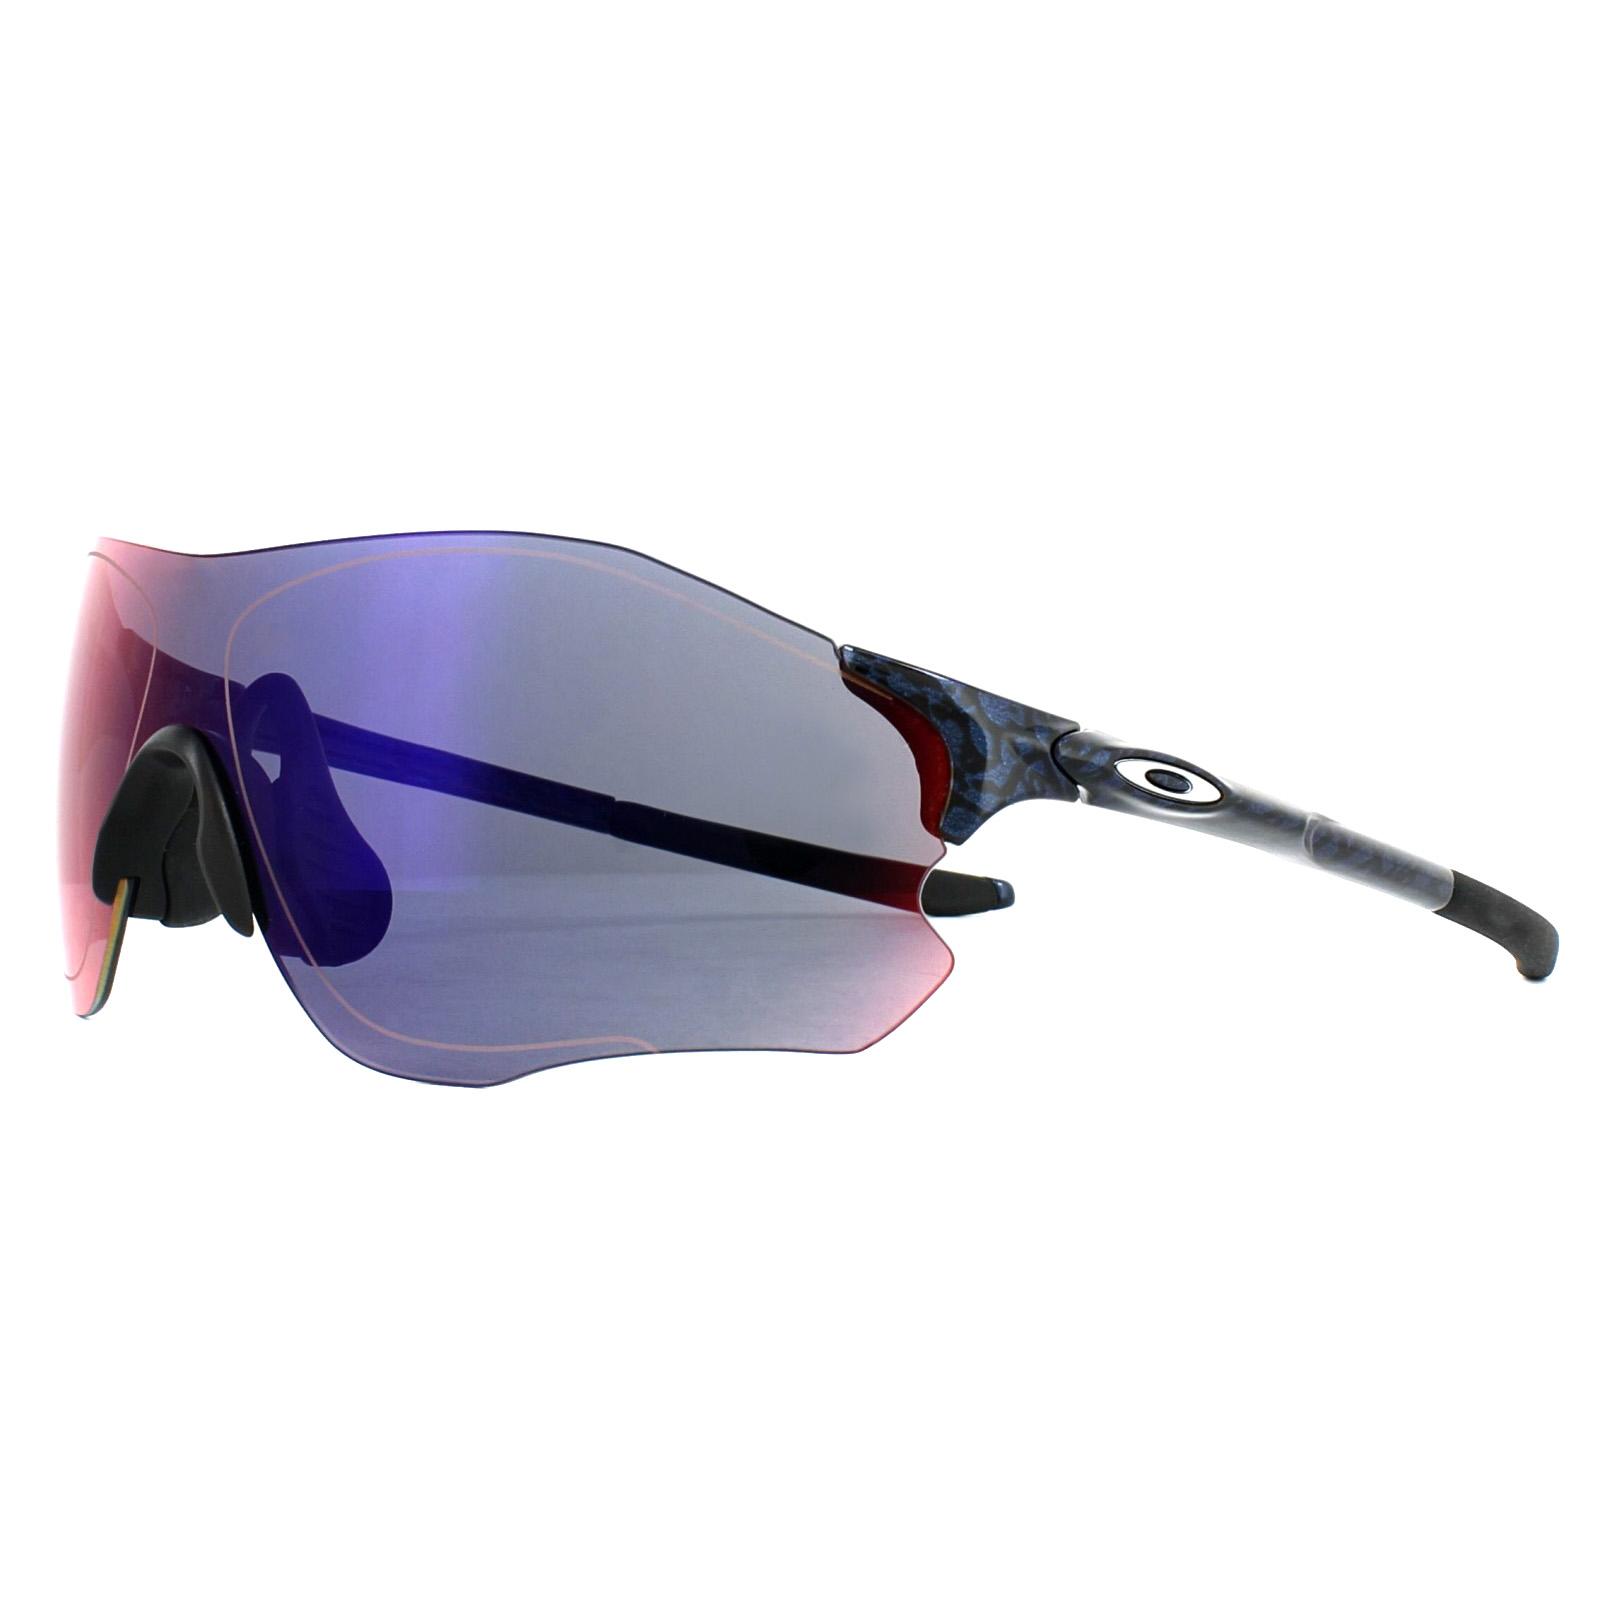 6aa305a29e2de Oakley Sunglasses EVZero Path OO9308-02 Planet X Positive Red ...